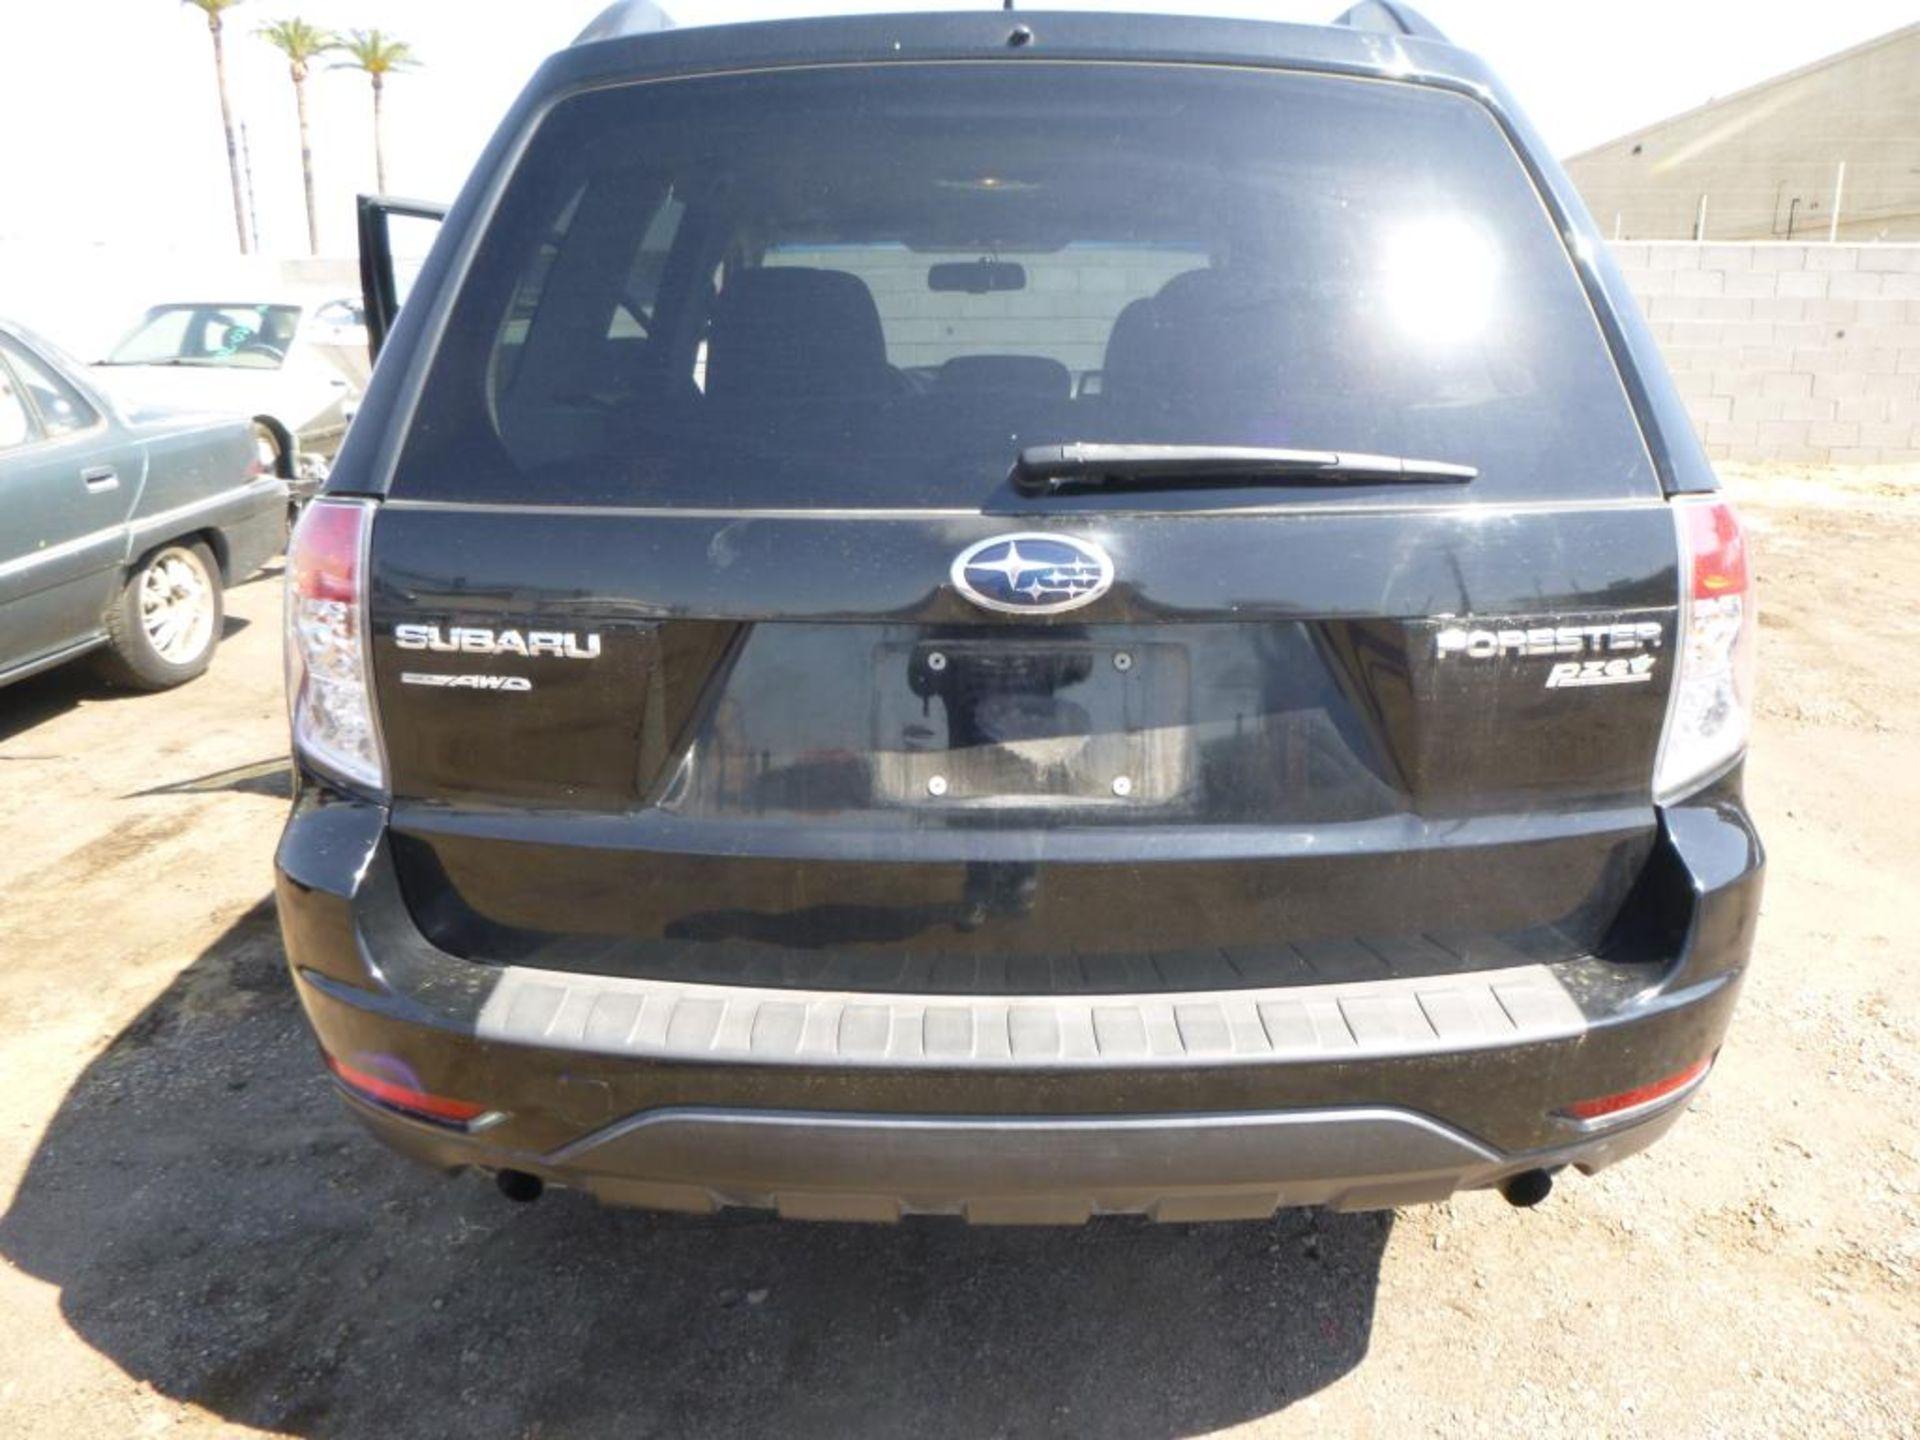 2011 Subaru Forester - Image 11 of 11